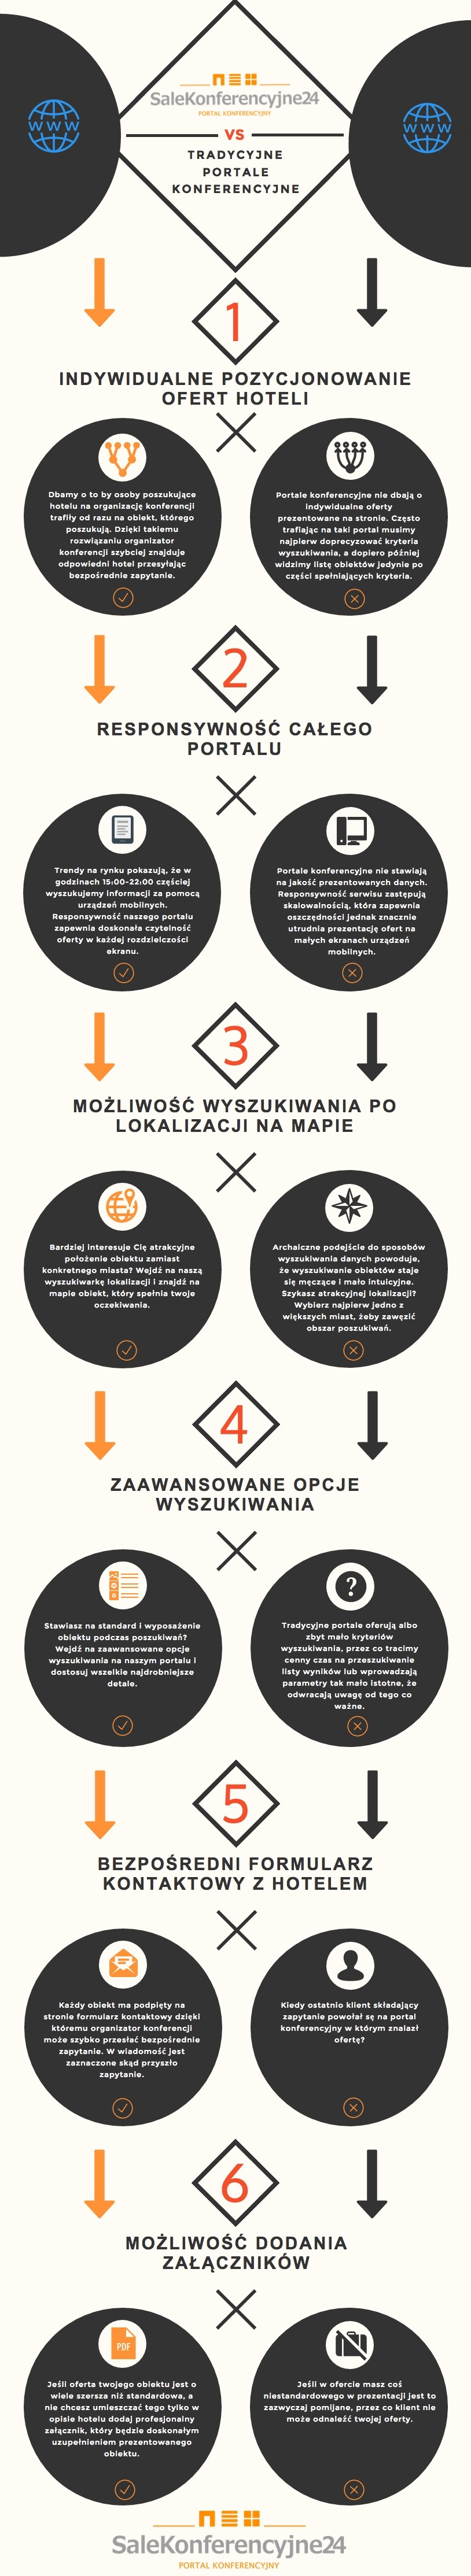 infografika SaleKonferencyjne24.net